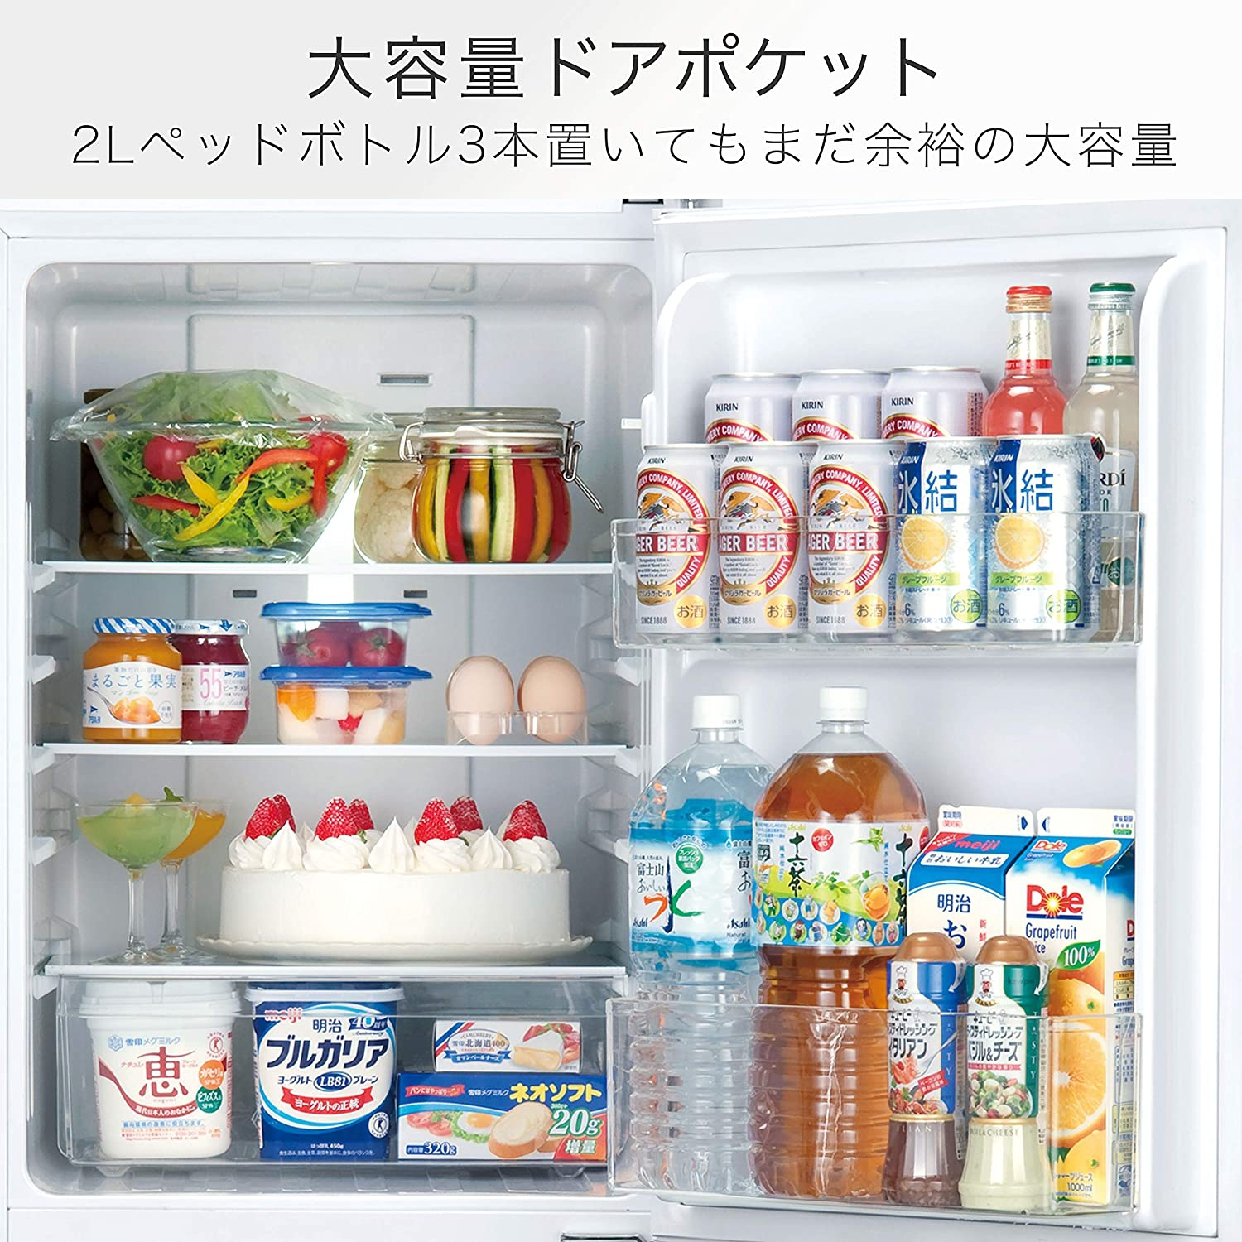 Hisense(ハイセンス)150L 冷凍冷蔵庫 HR-D15Cの商品画像5